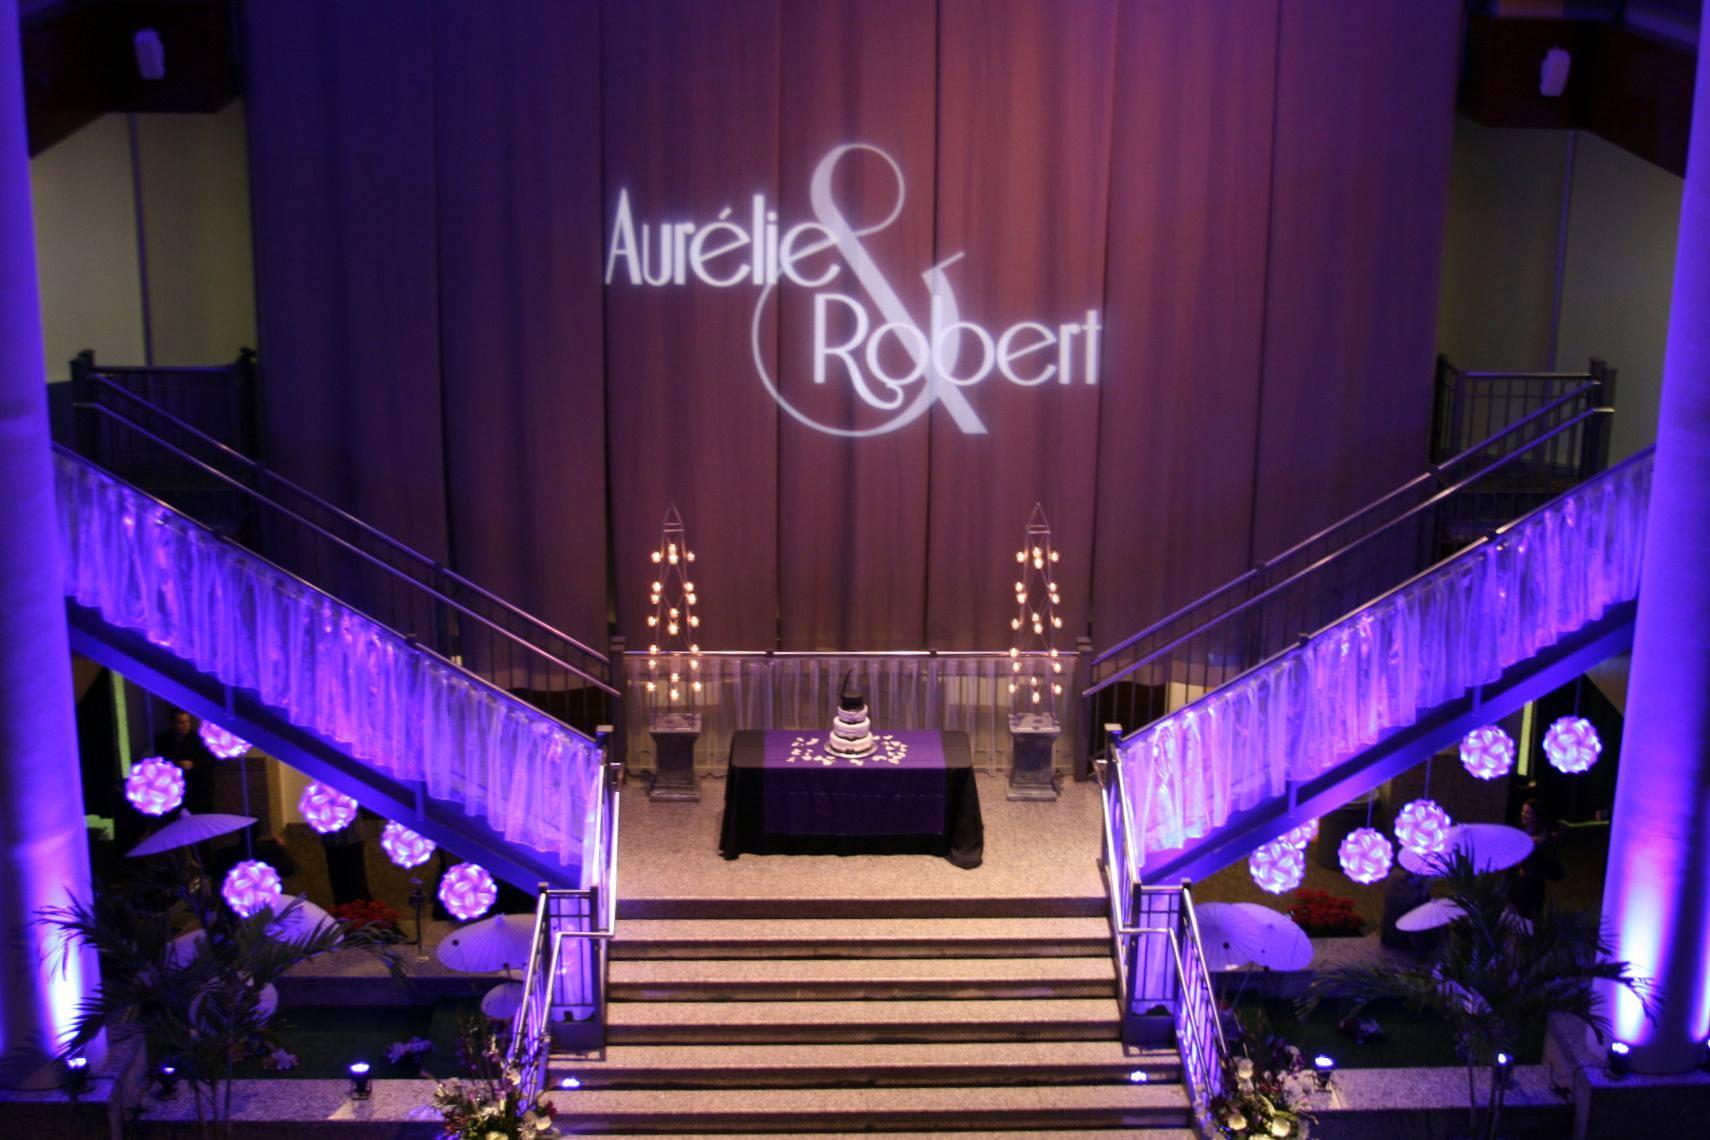 Innovative lighting design wedding and event lighting services